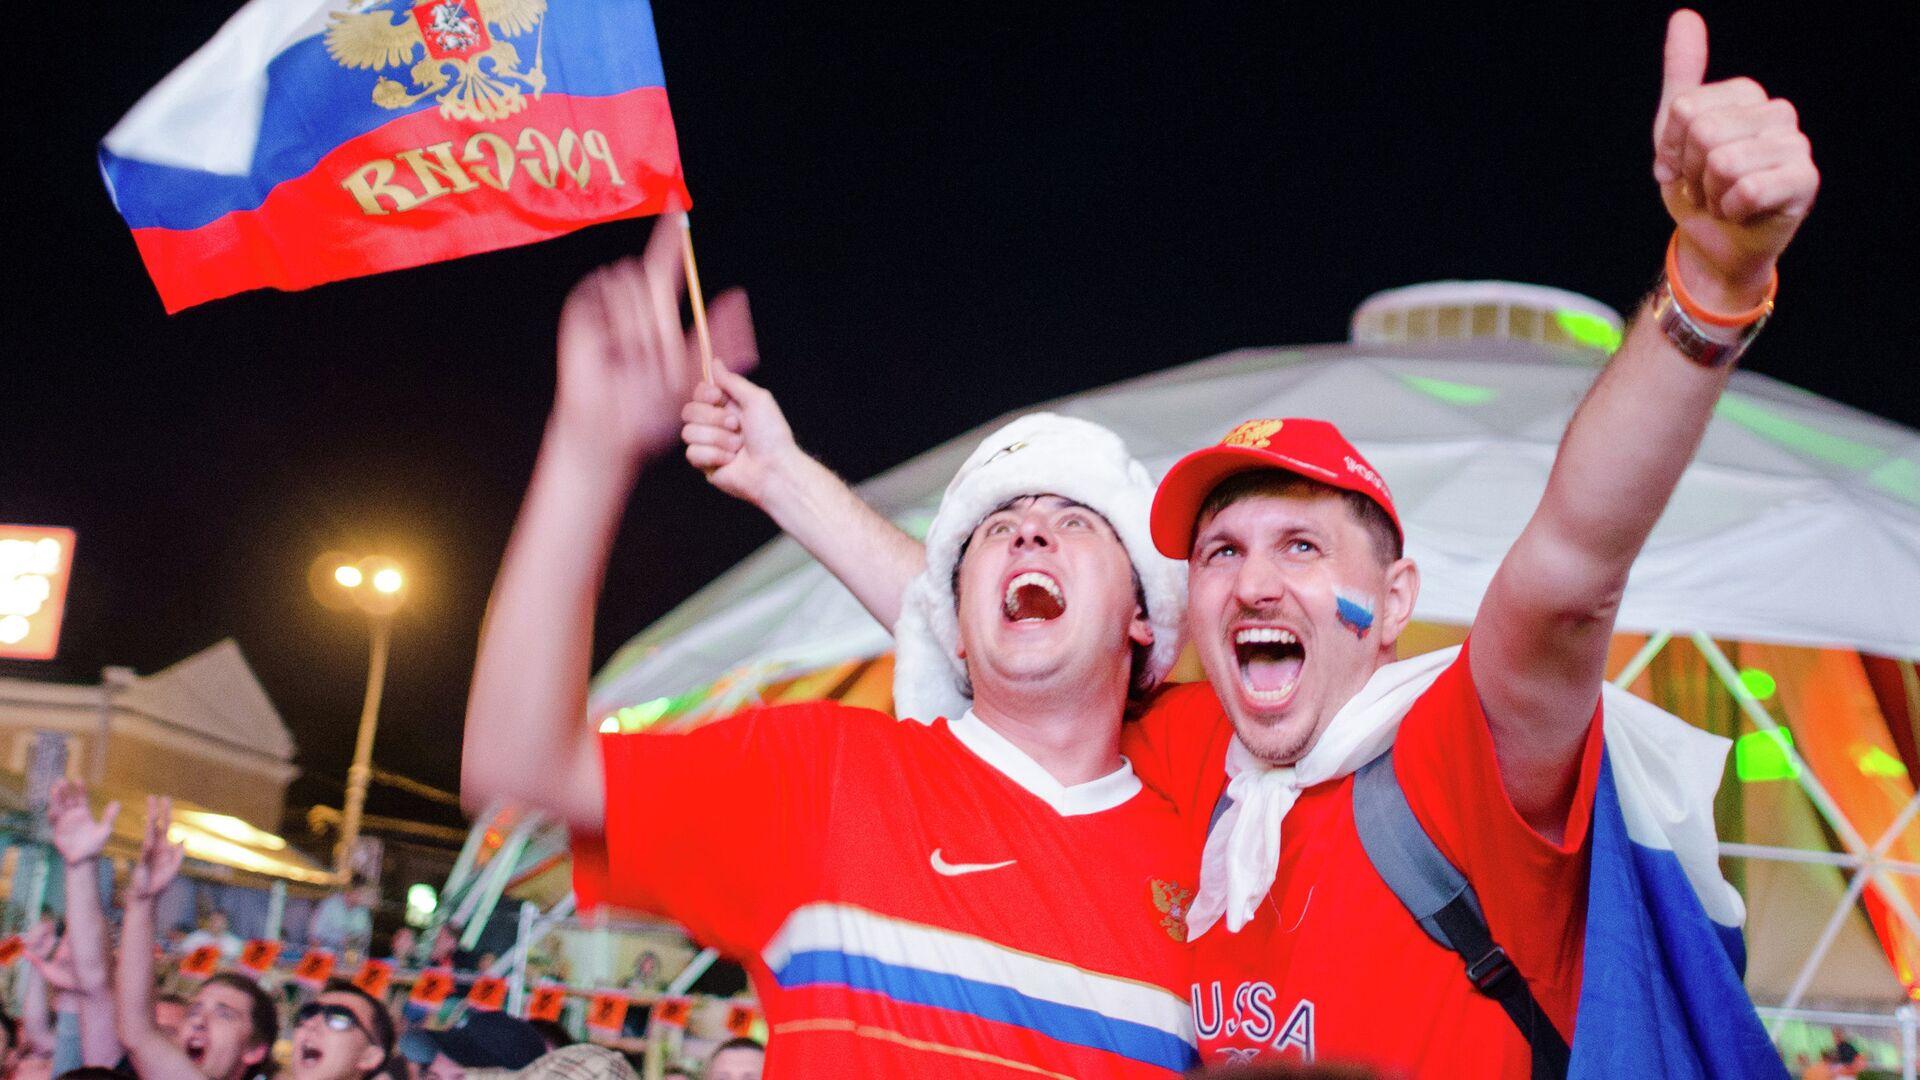 Фан-зона к Евро-2012 в Харькове - РИА Новости, 1920, 02.06.2020